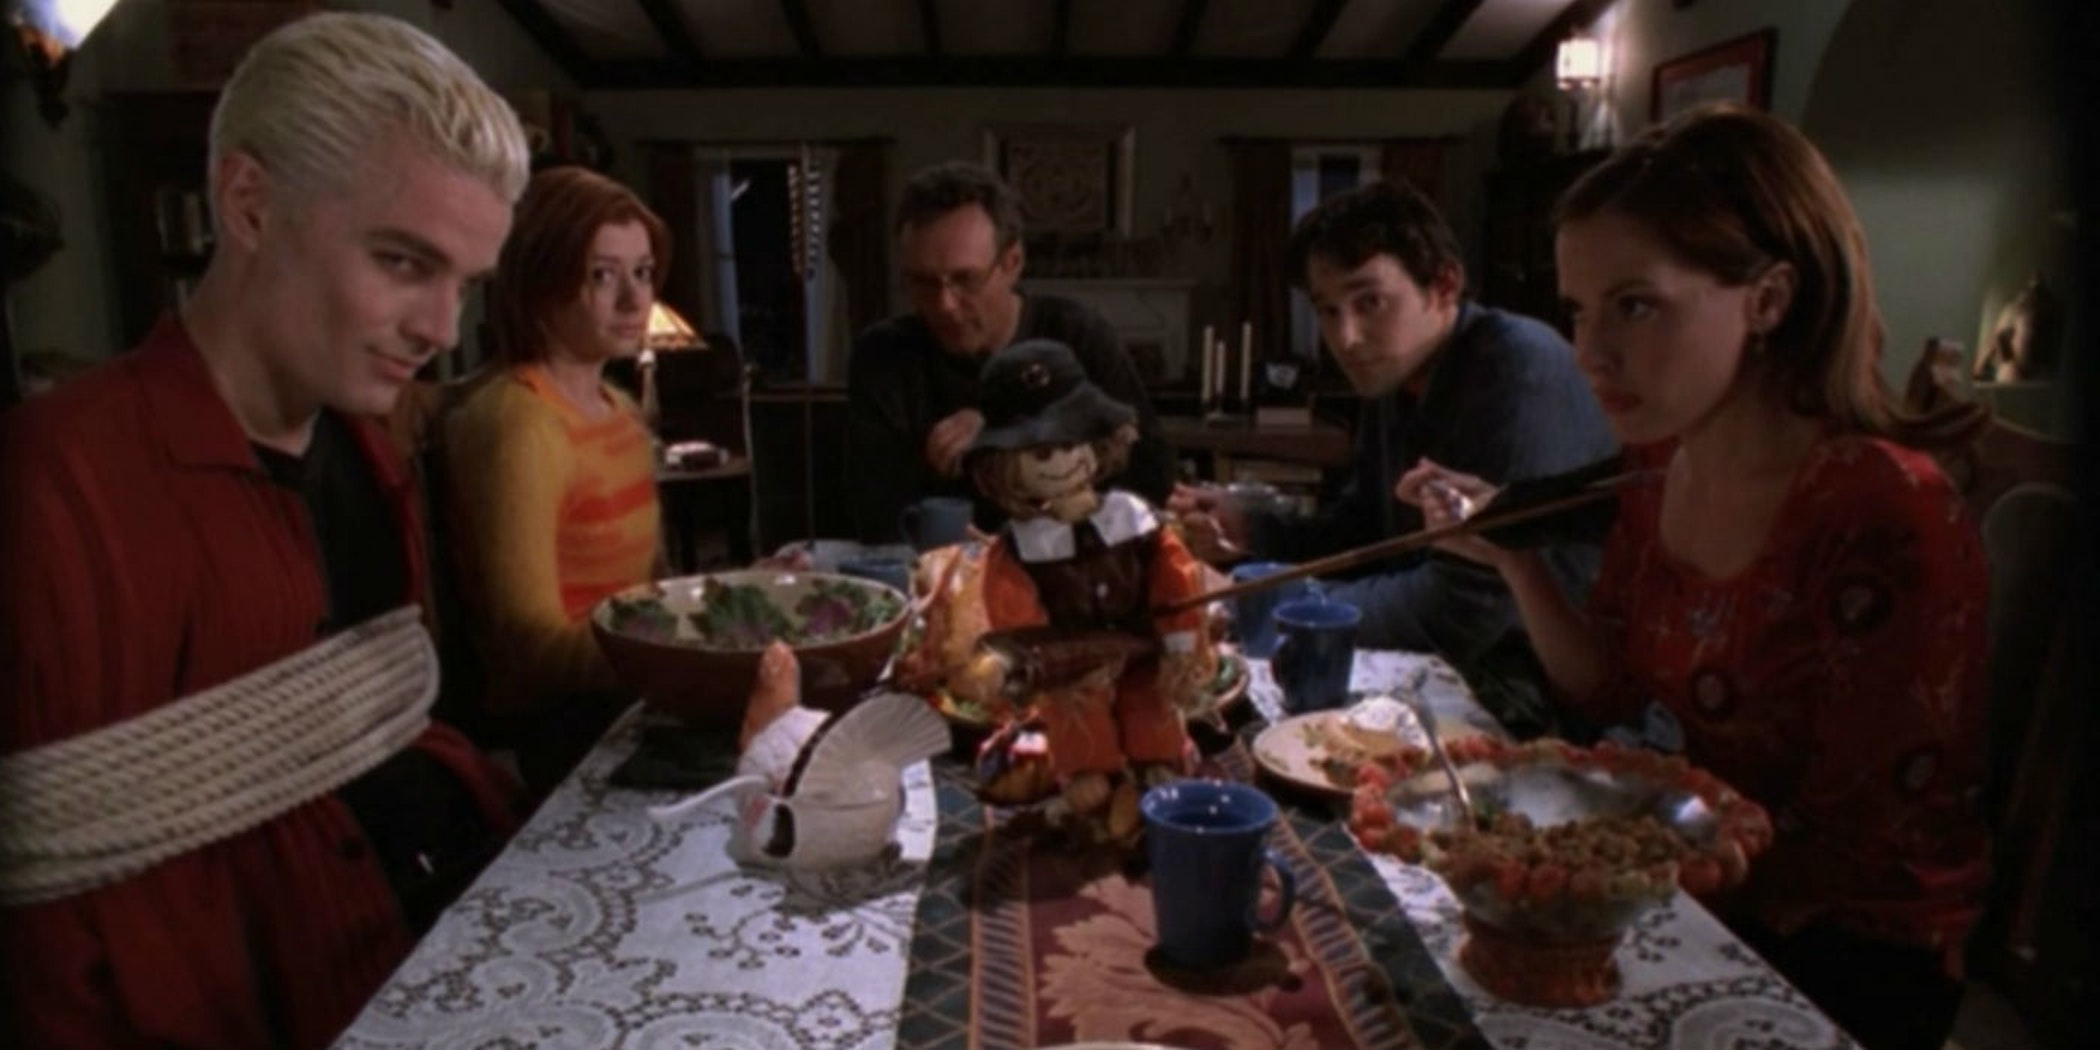 Buffy the Vampire Slayer Thanksgiving episode